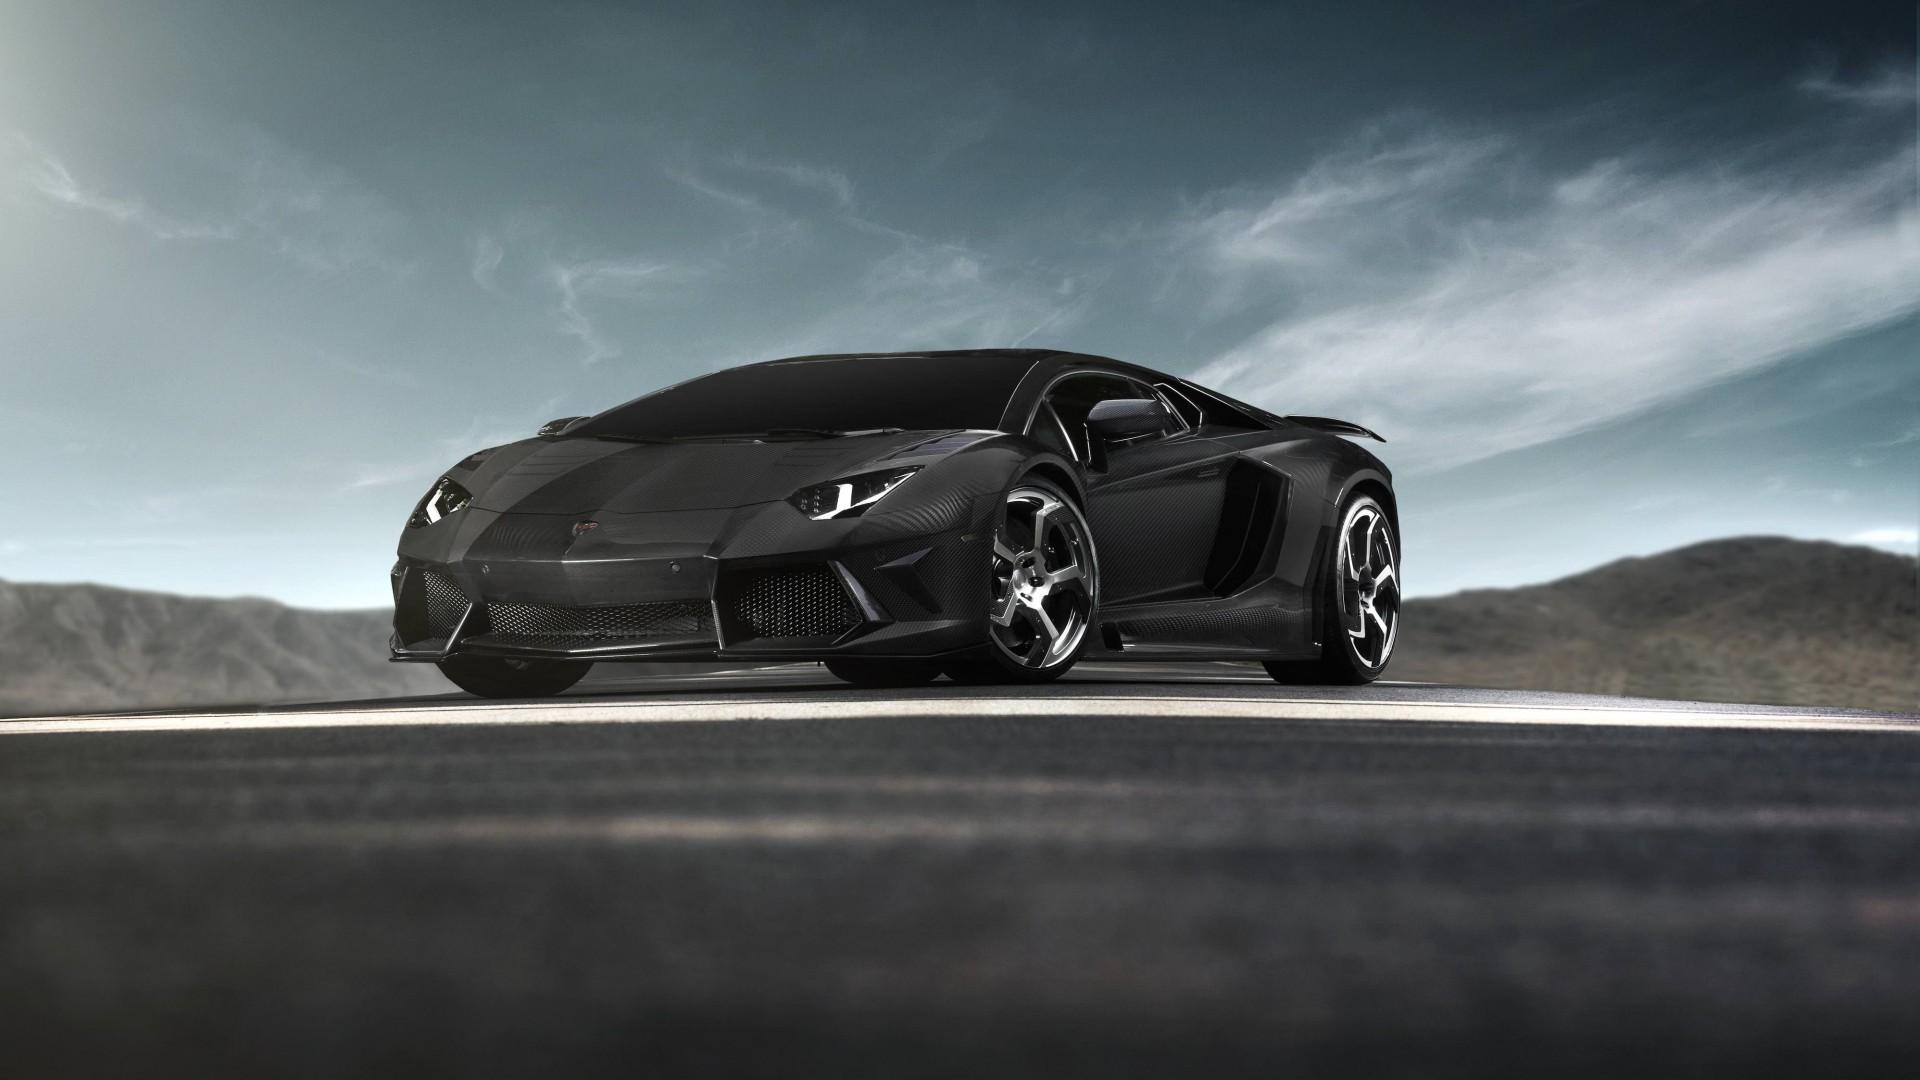 Mansory Carbonado Lamborghini Aventador LP700-4 Wallpaper for Desktop ...